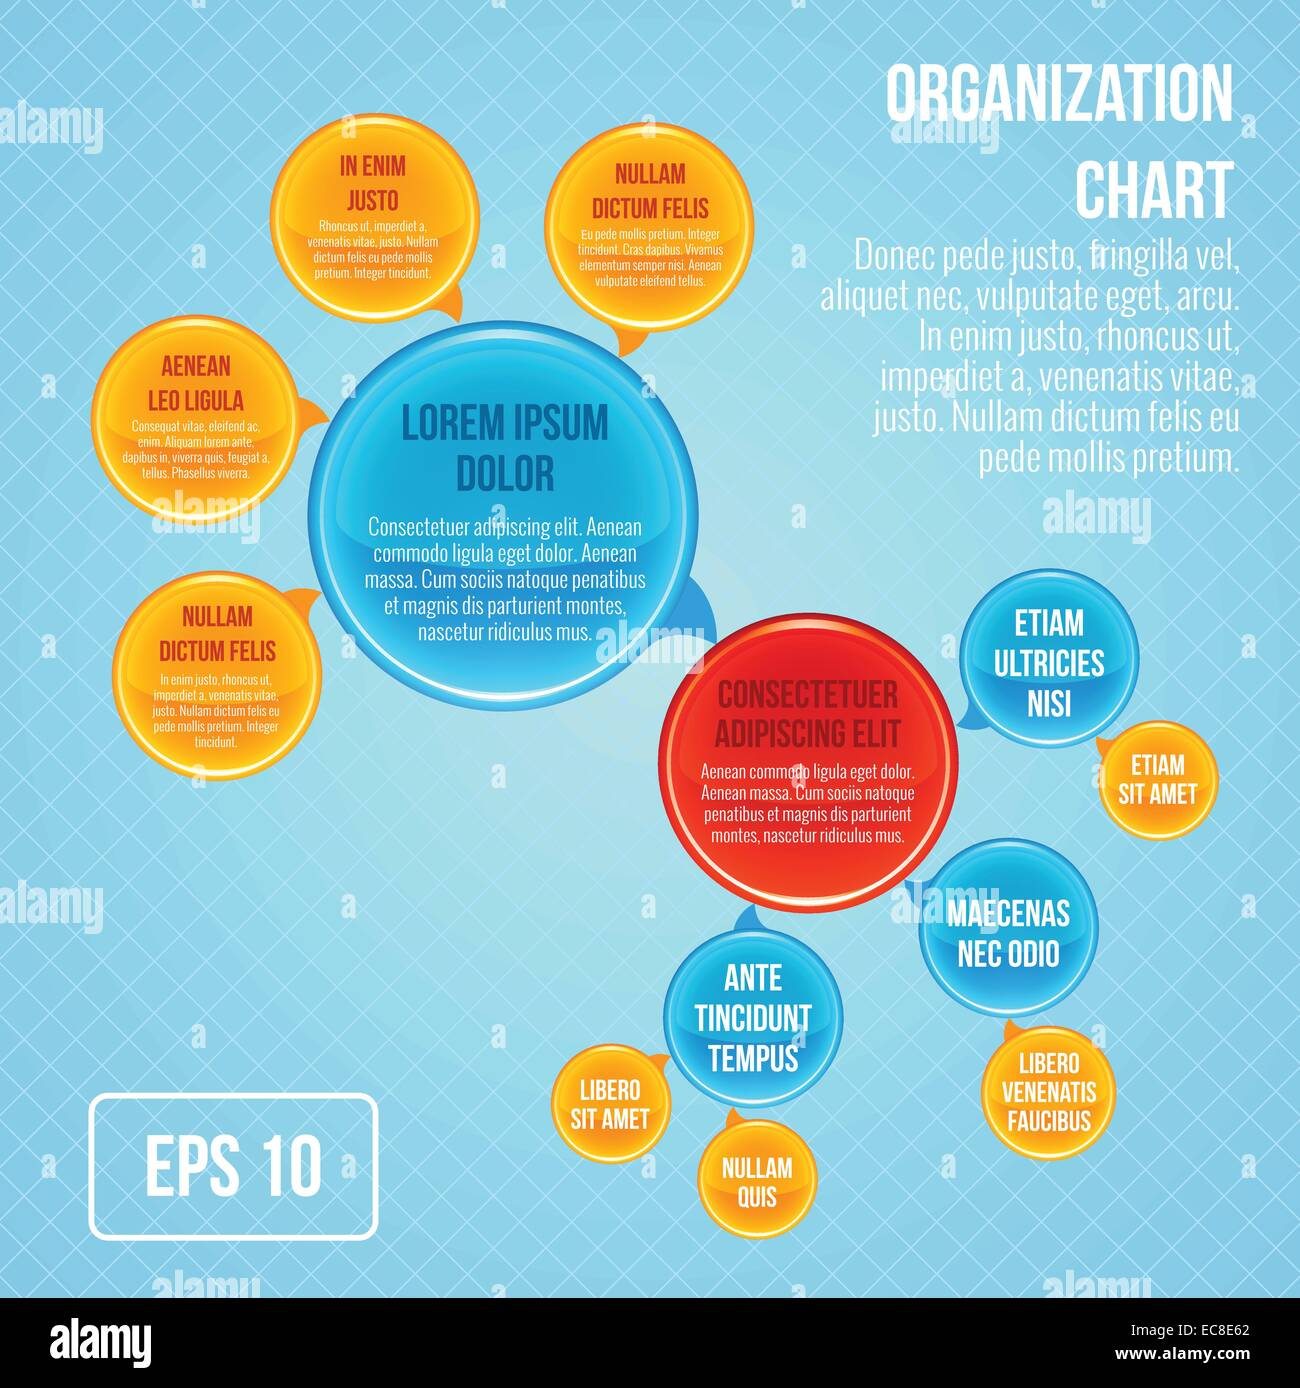 Organizational Chart Stock Photos & Organizational Chart Stock ...